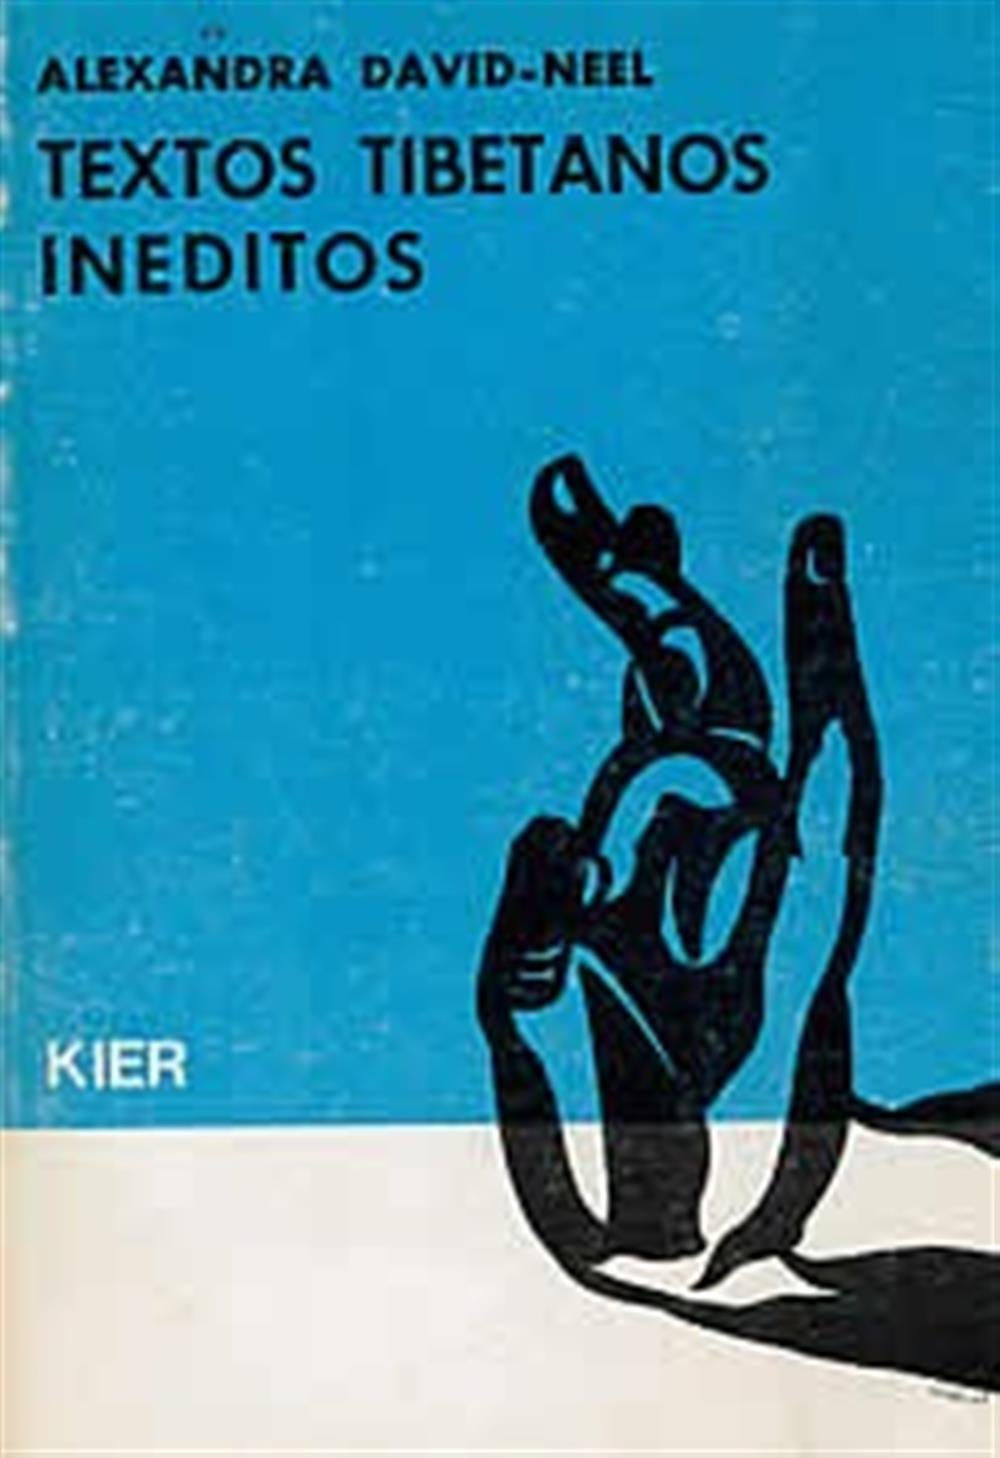 Textos Tibetanos ineditos